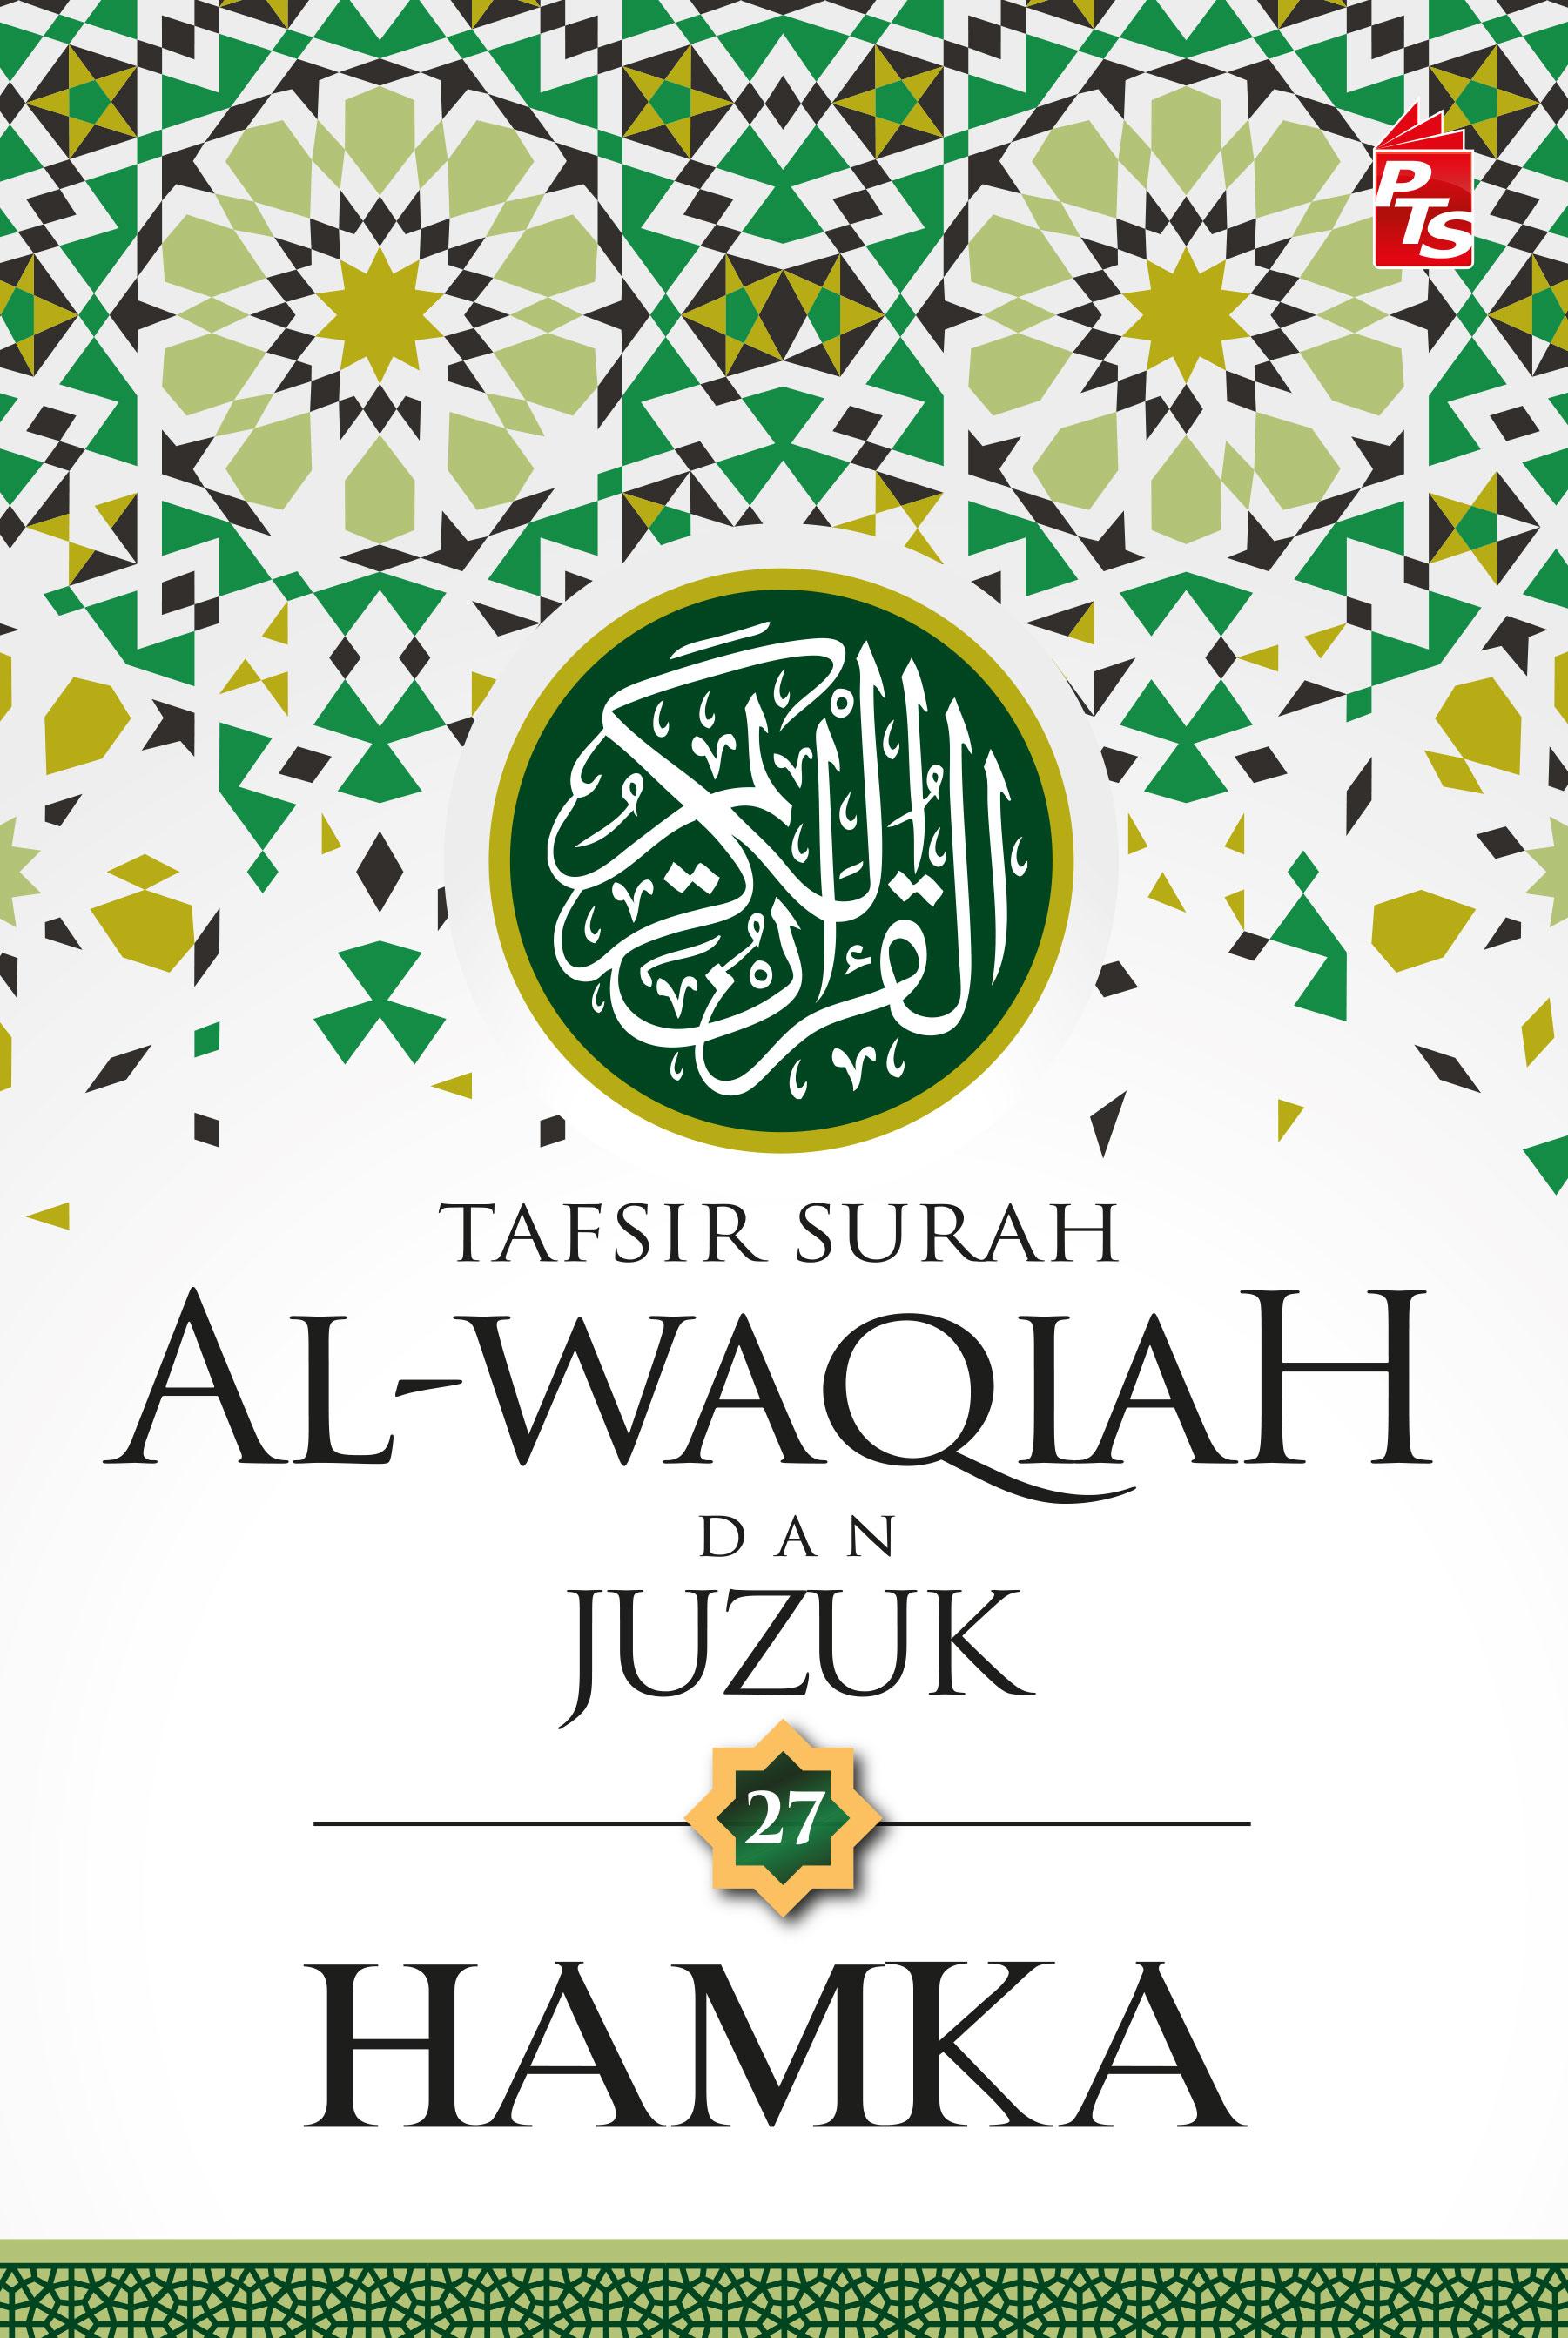 Tafsir Surah Al-Waqiah dan Juzuk 27 - HAMKA